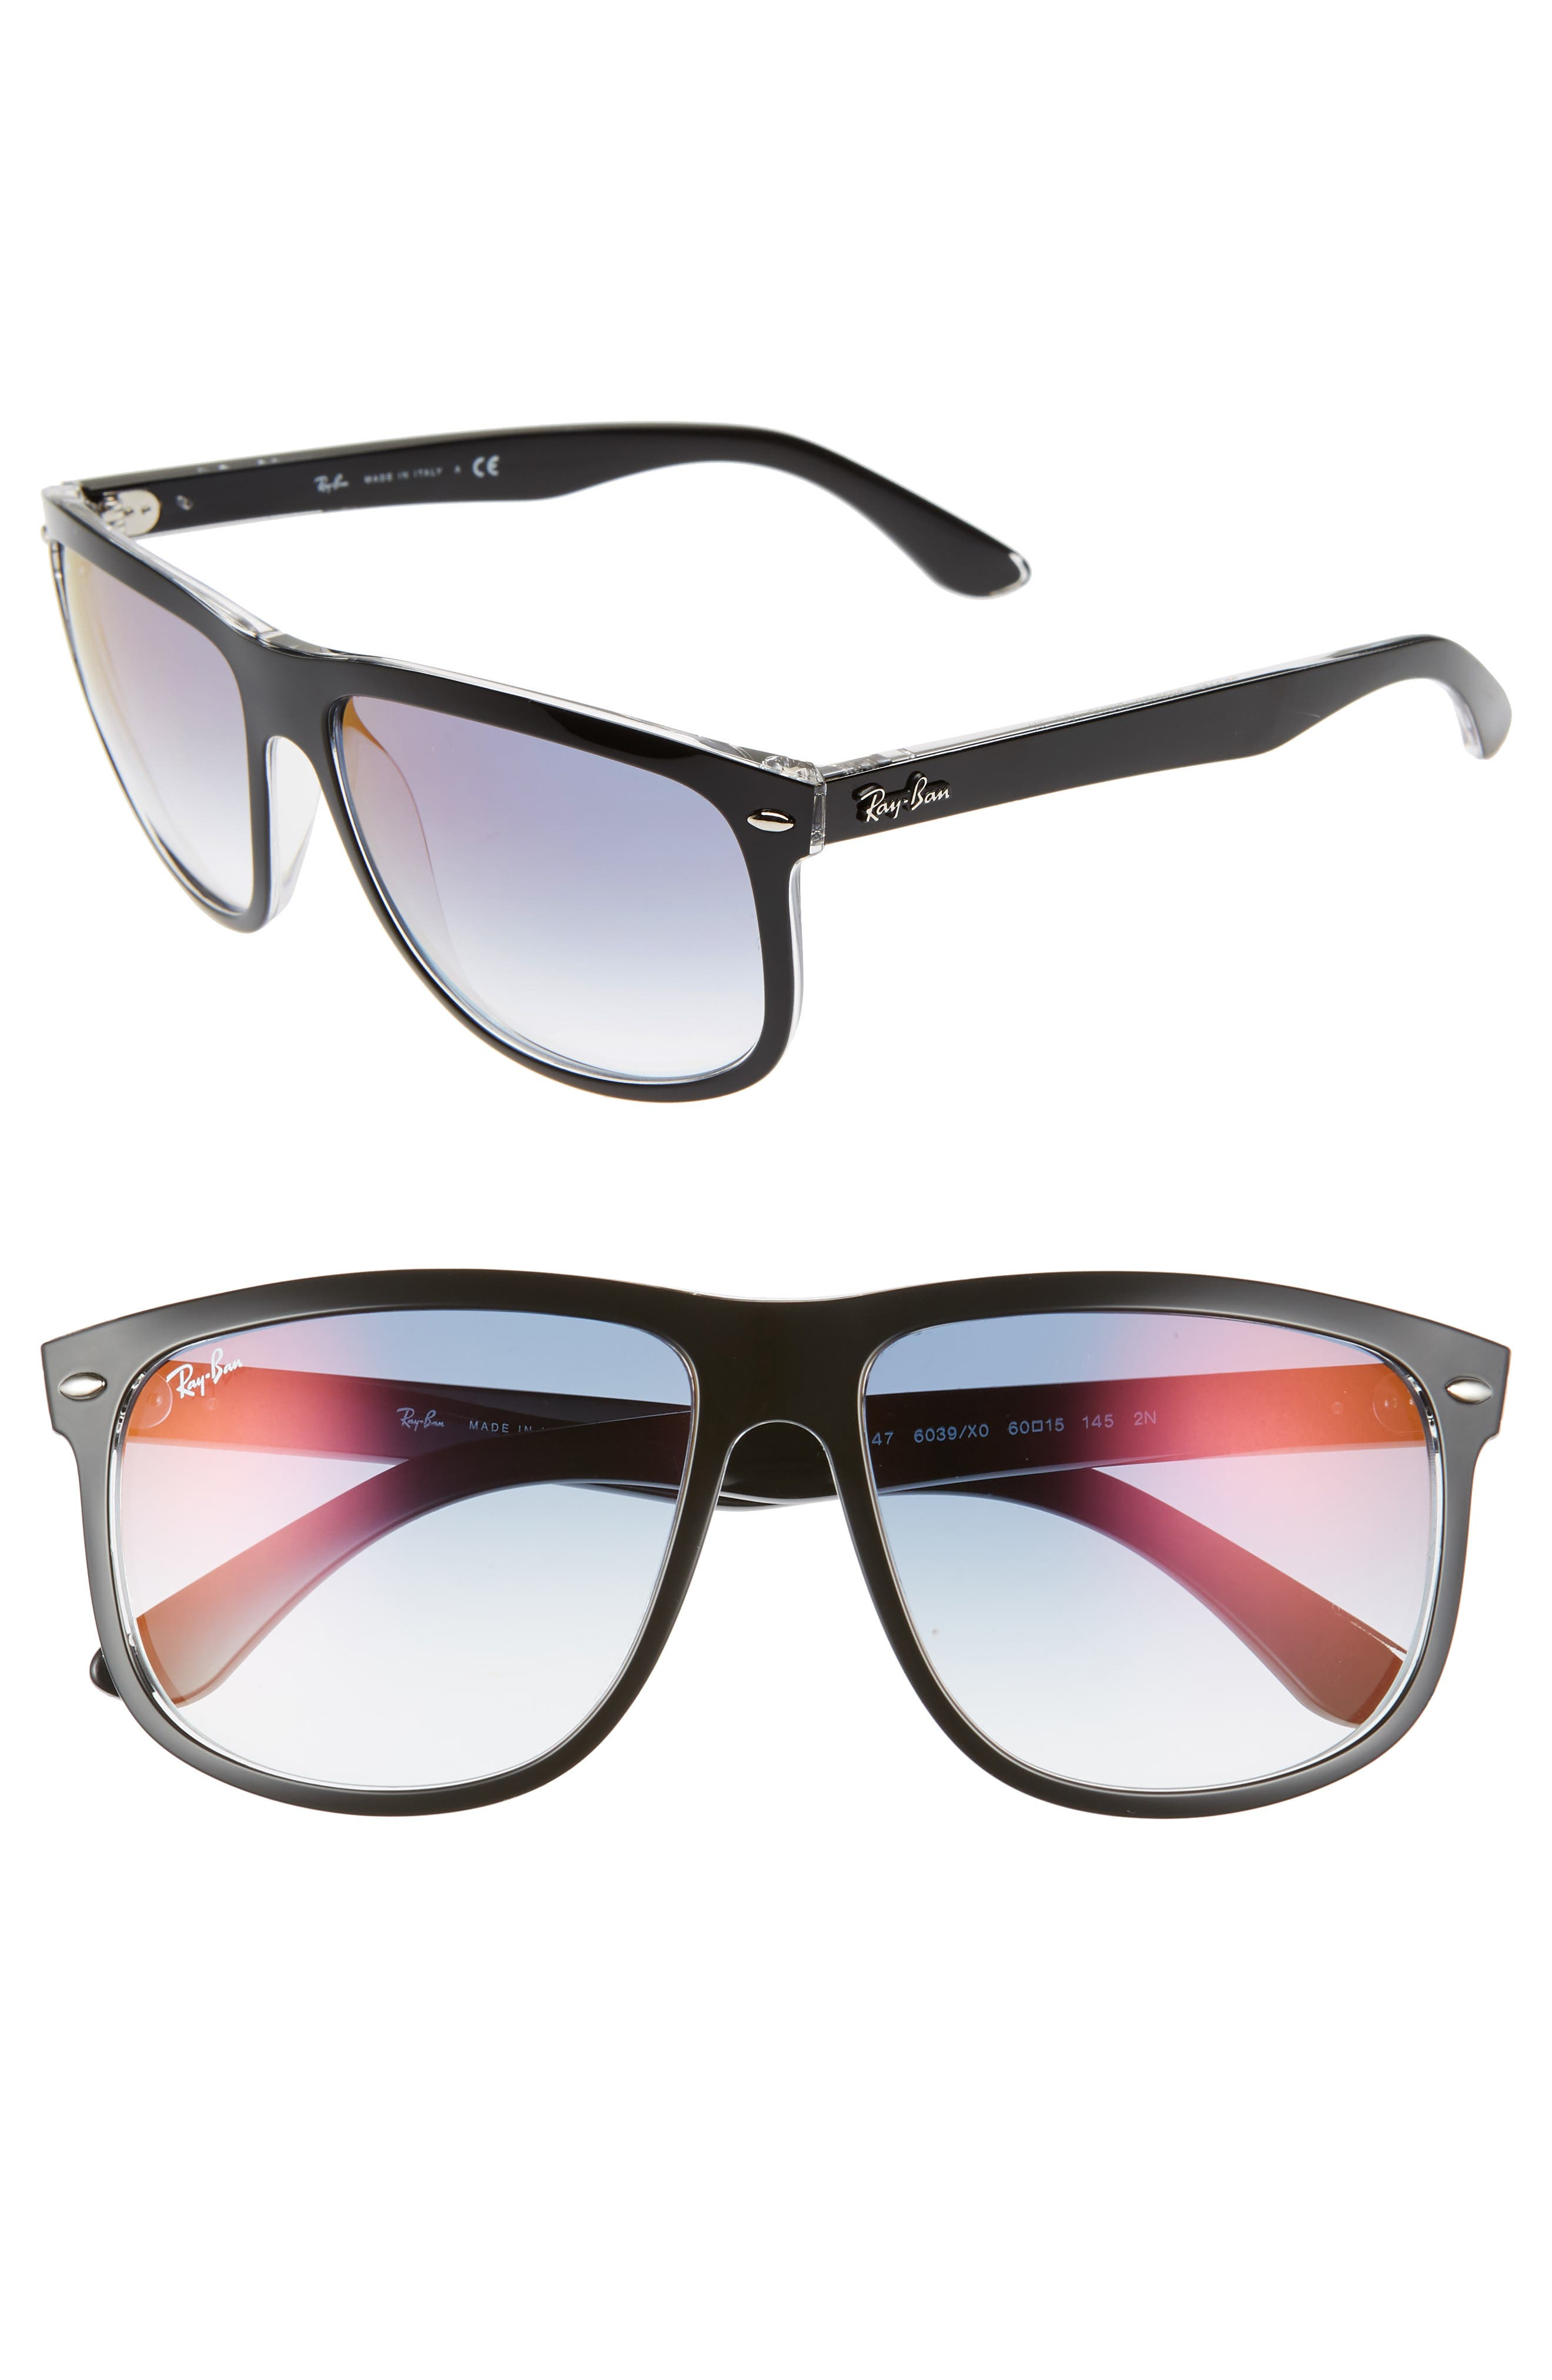 Ray-Ban 60Mm Mirrored Sunglasses - Top Black Gradient Mirror